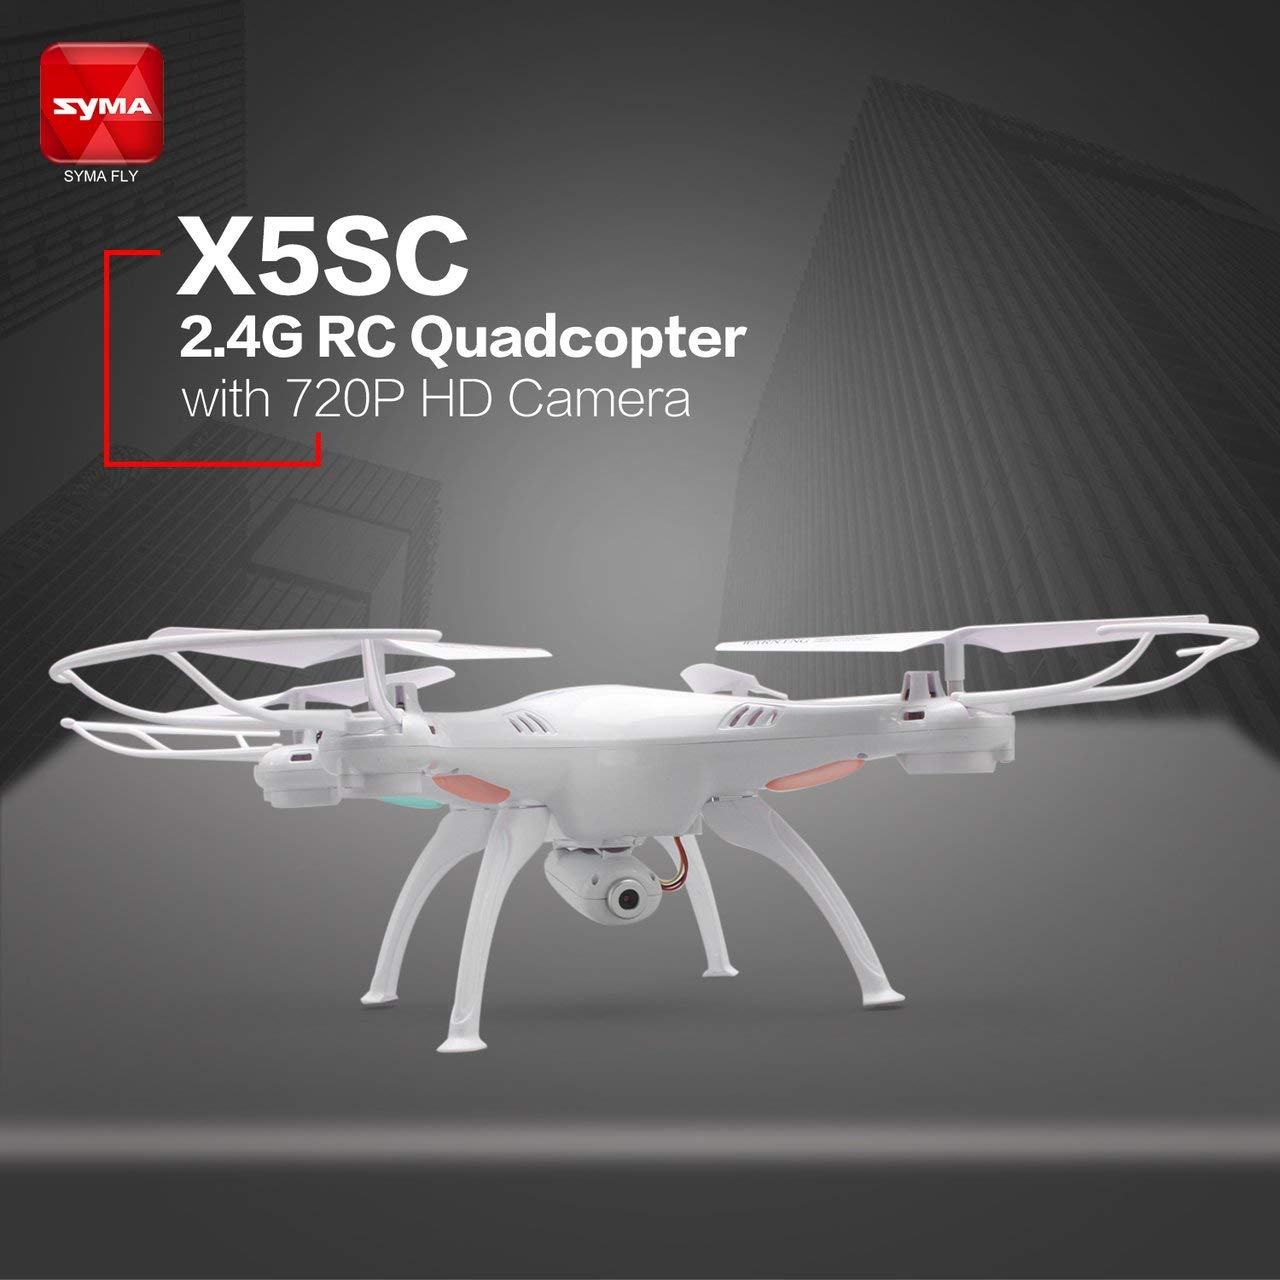 Jasnyfall SYMA X5SC 2.4G RC RC RC Quadcopter Drone mit 720P HD Kamera Headless Modus Weiß 5e6188